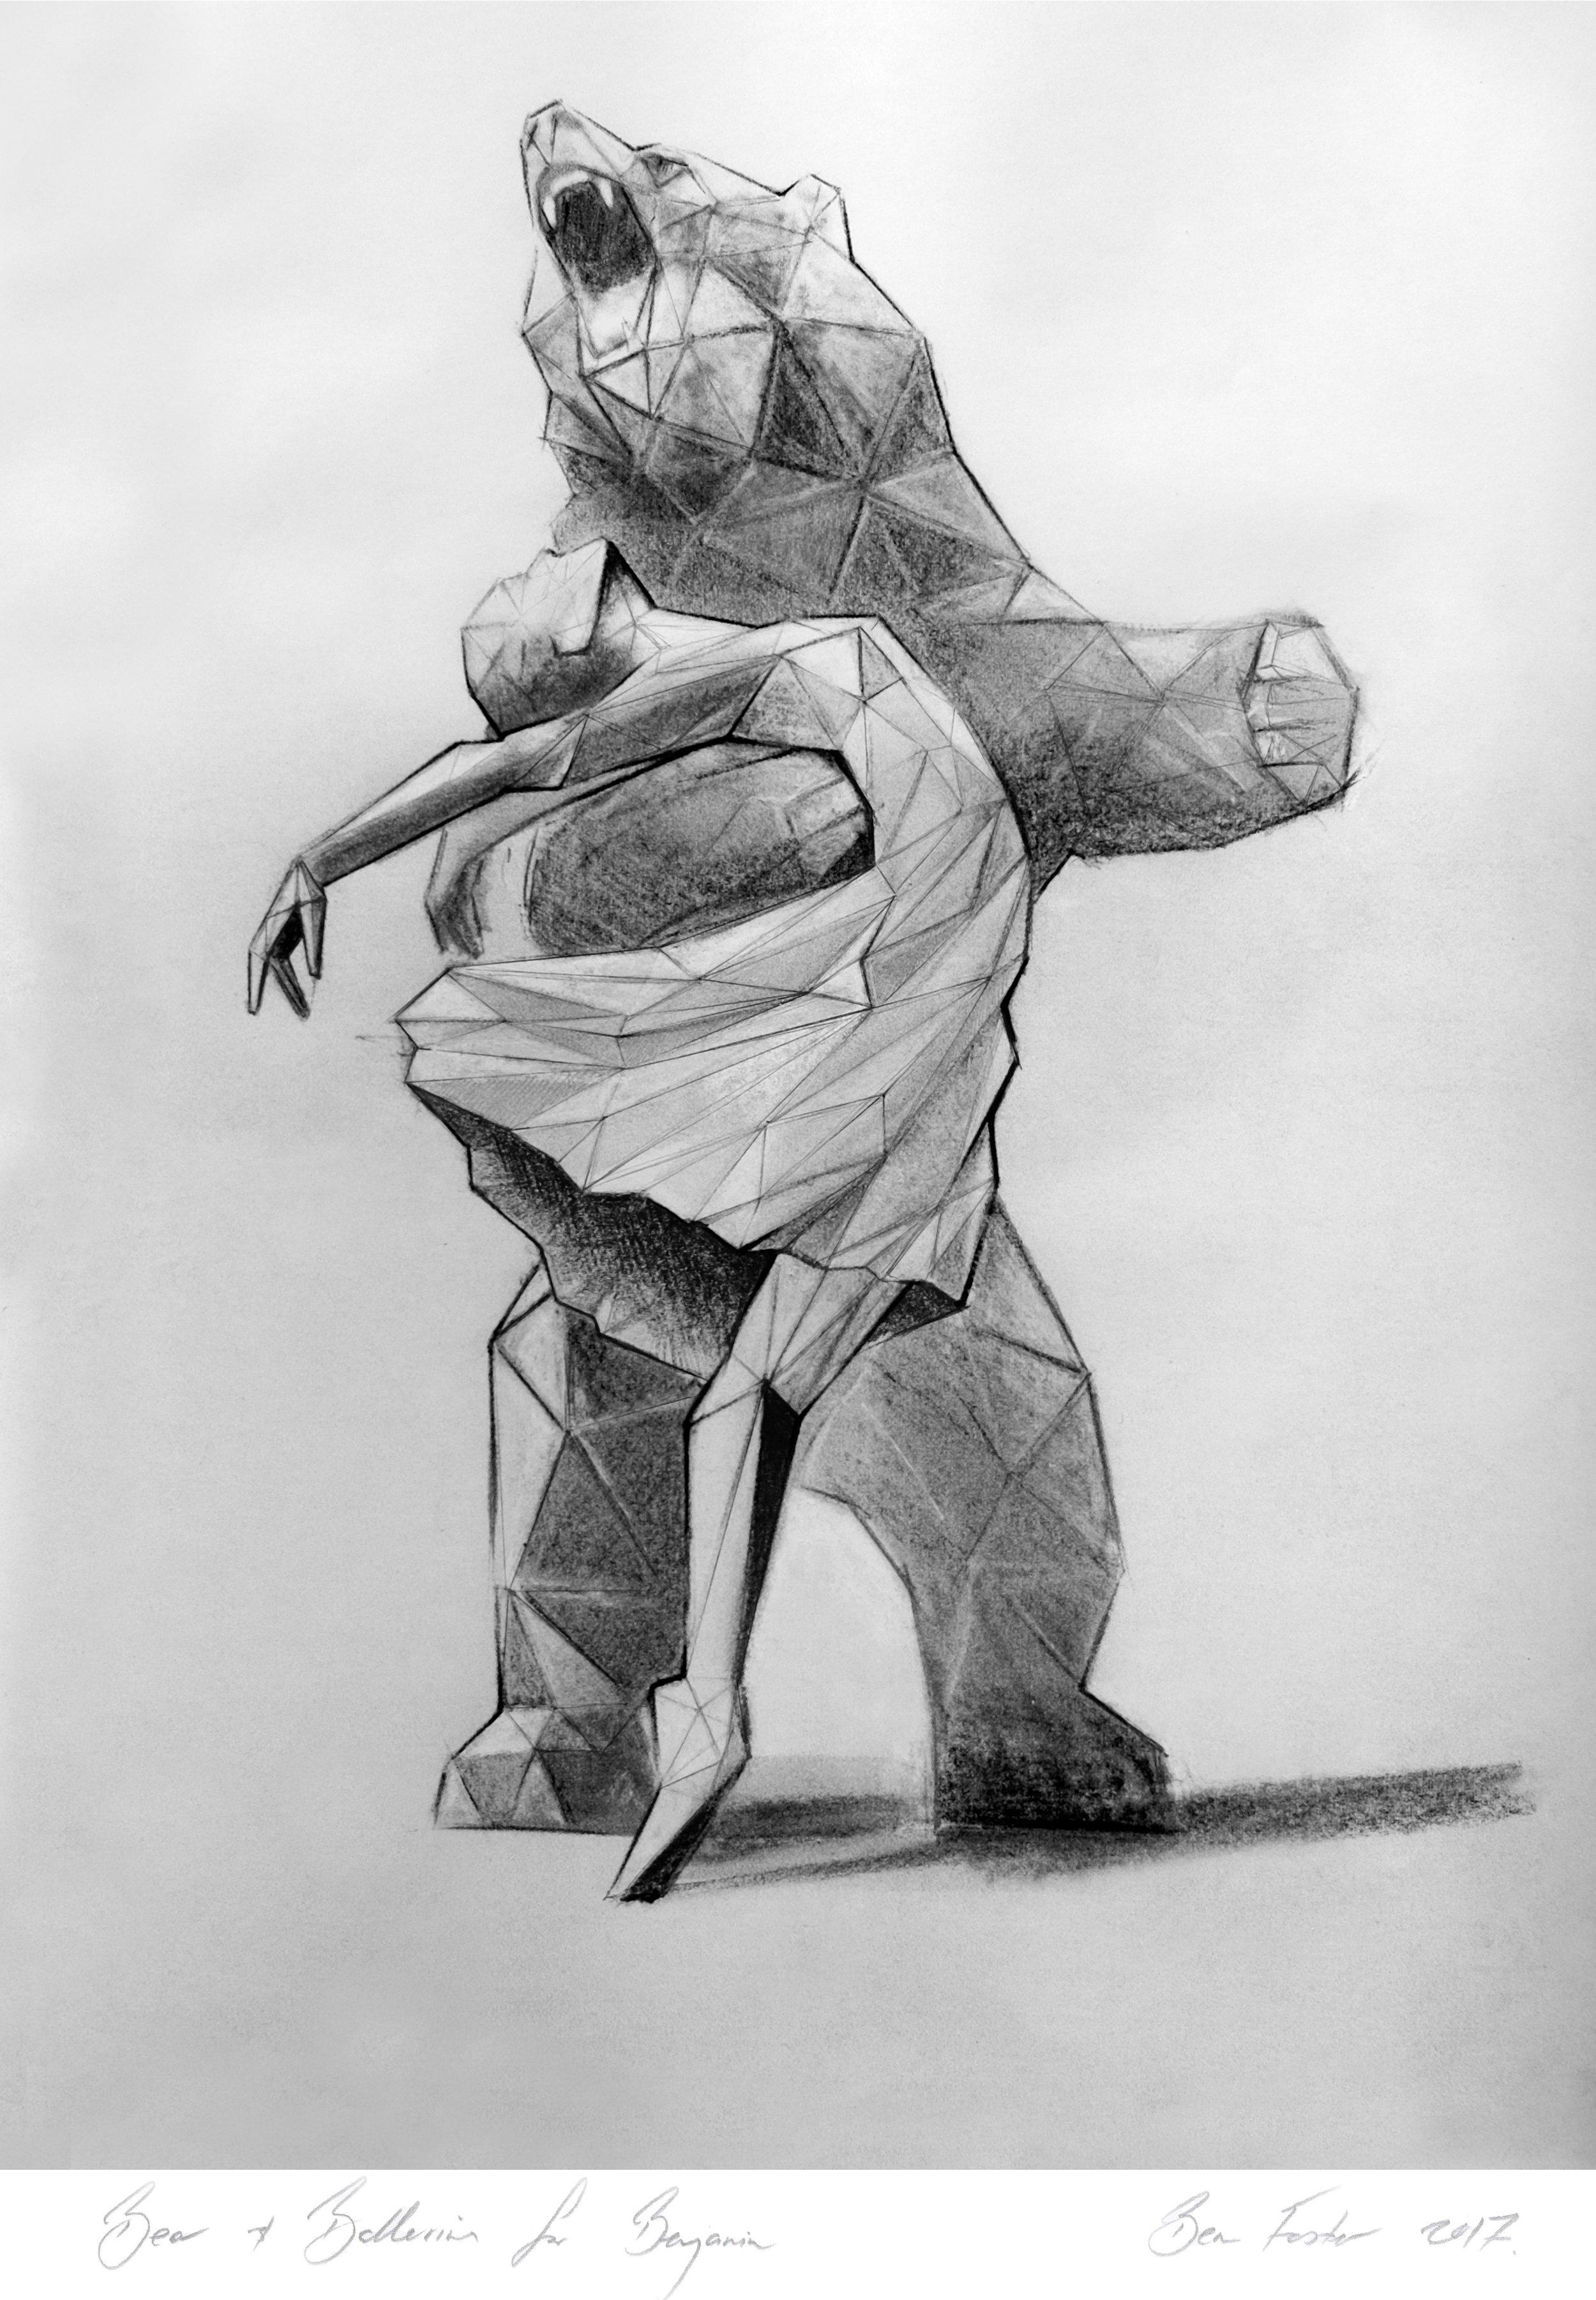 The Bear and Ballerina concept sketch by Ben Foster